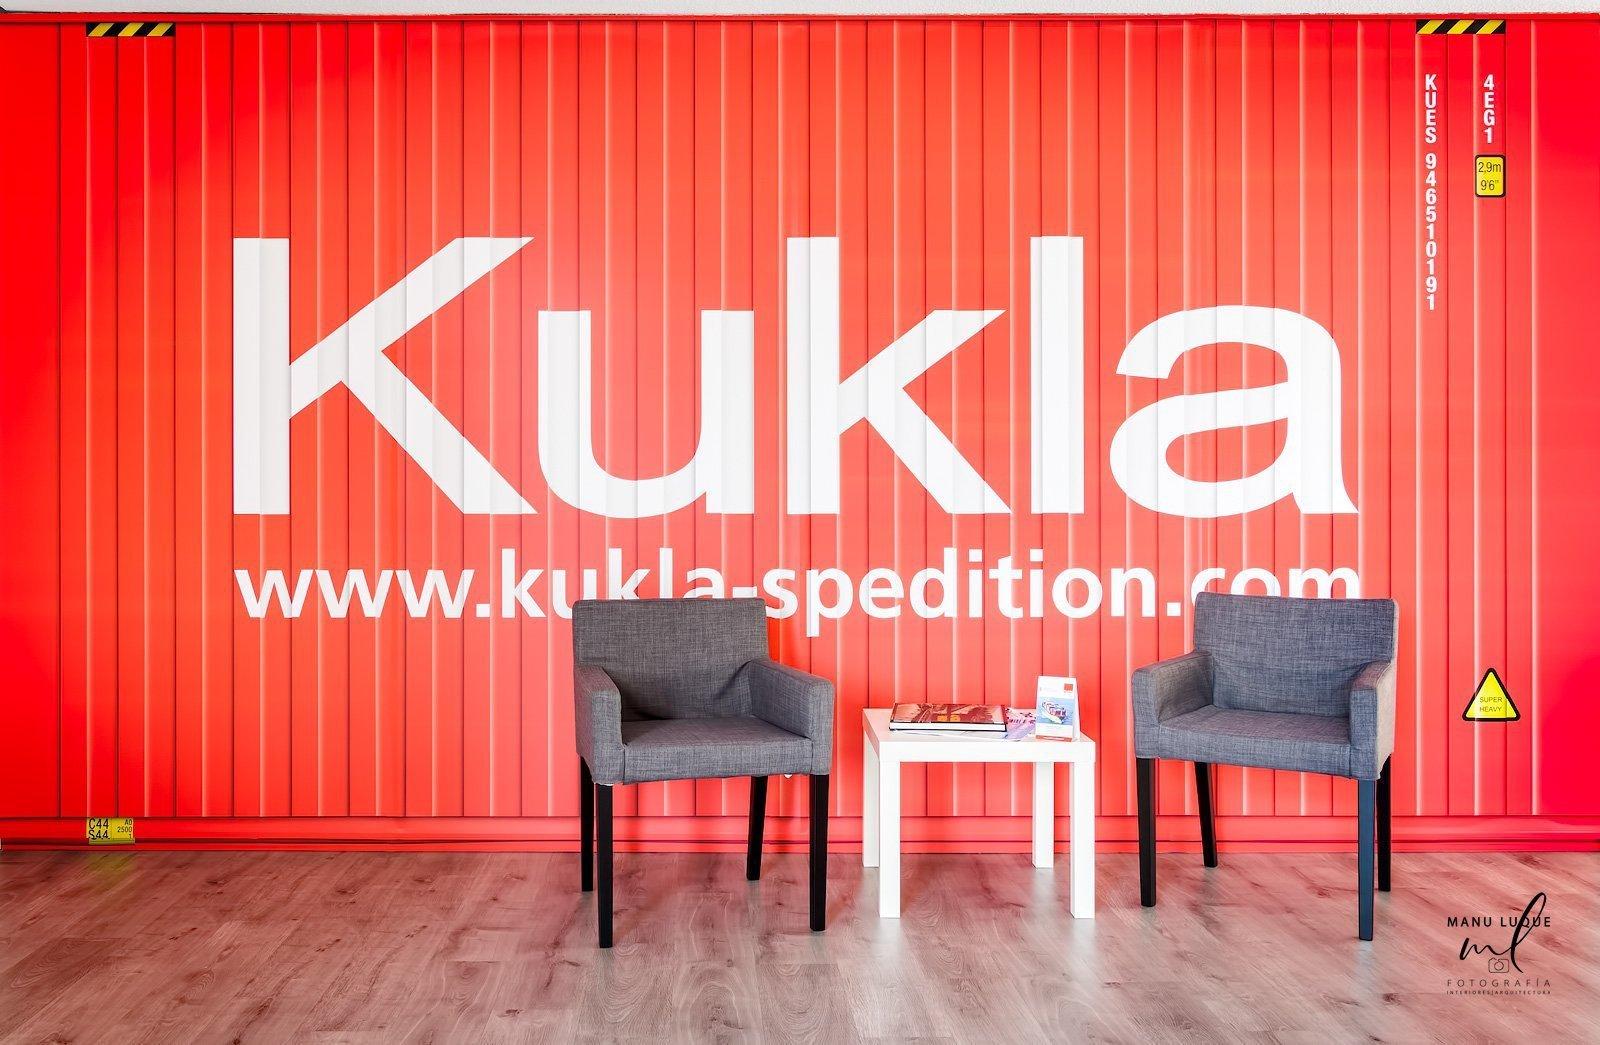 Oficinas Kukla Spedition 01